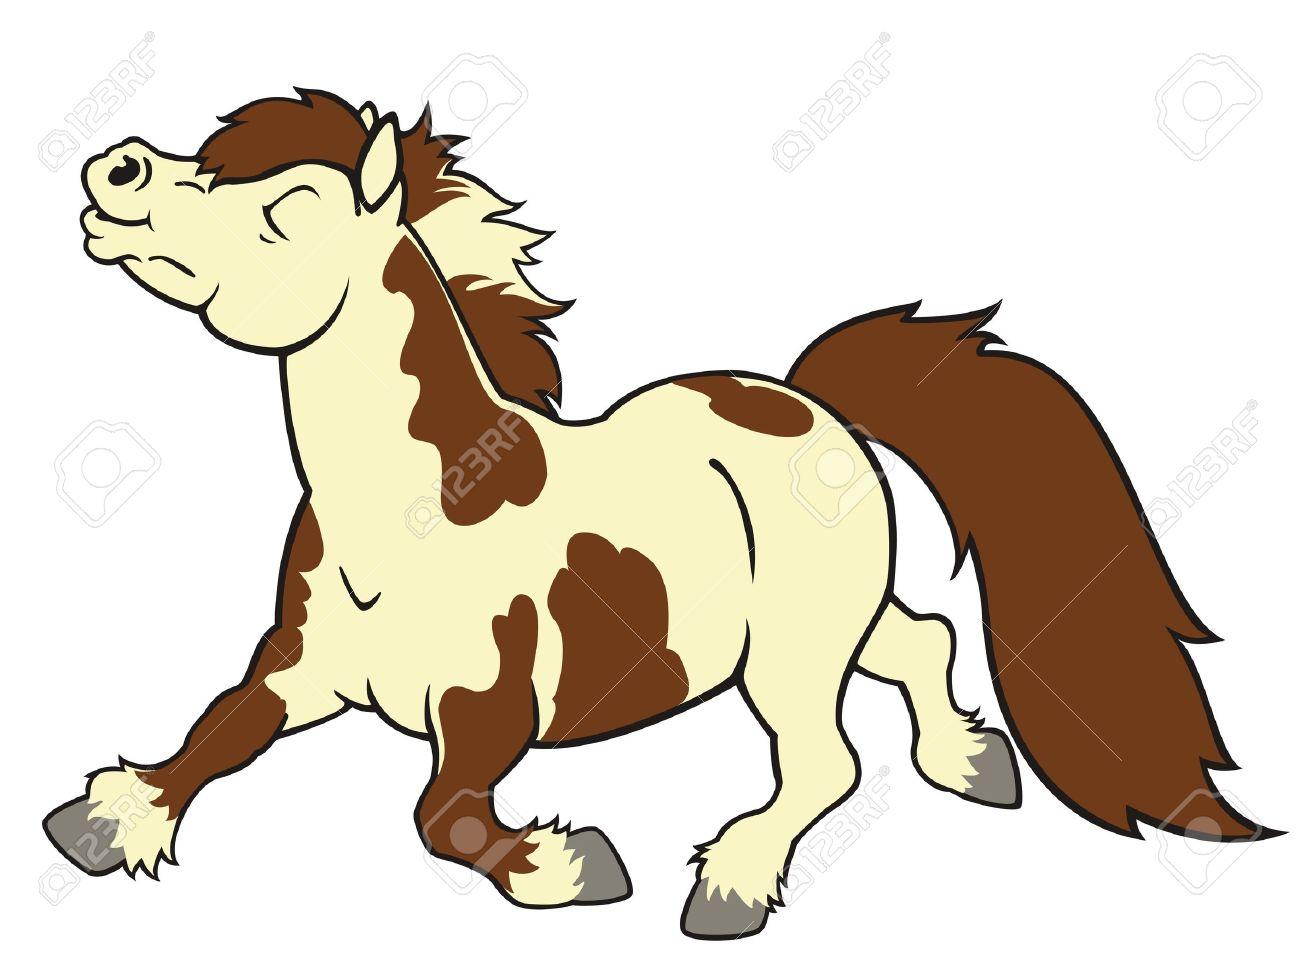 shetland pony,running horse,cartoon picture isolated on white background,children illustration,side view  image for little kids Stock Vector - 16832740